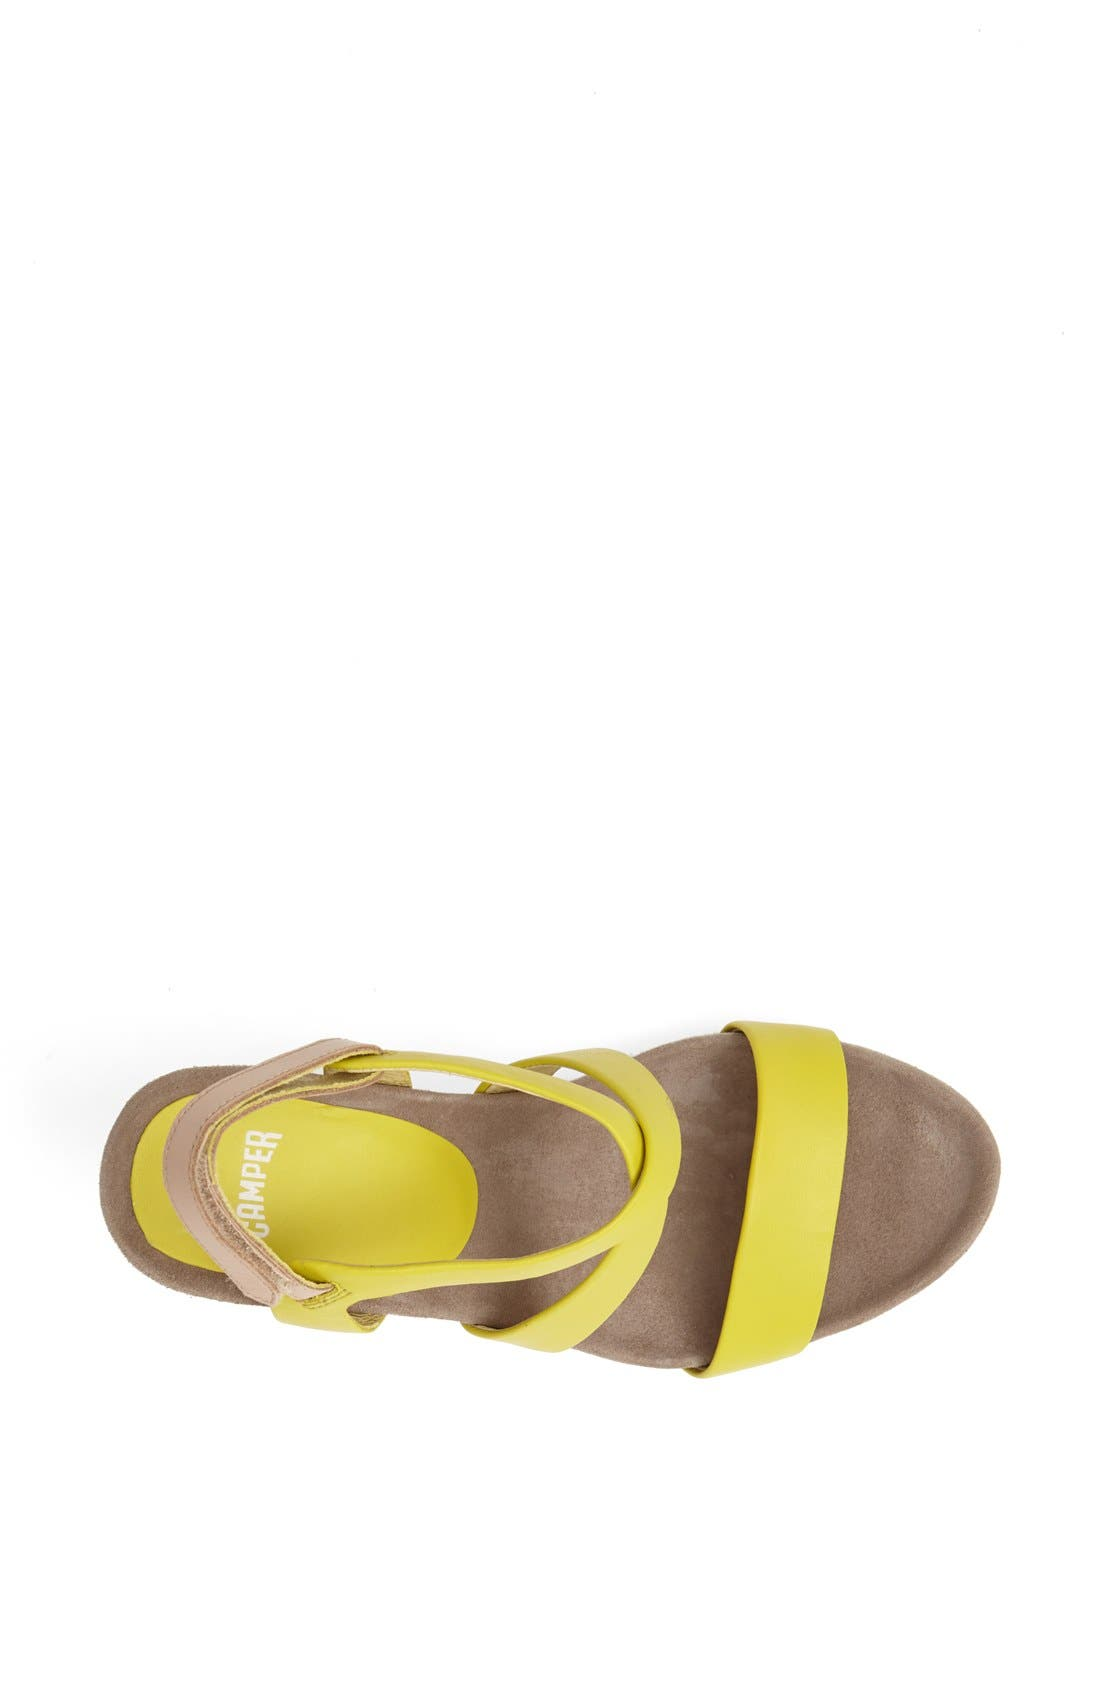 Alternate Image 3  - Camper 'Allegra' Block Heel Sandal